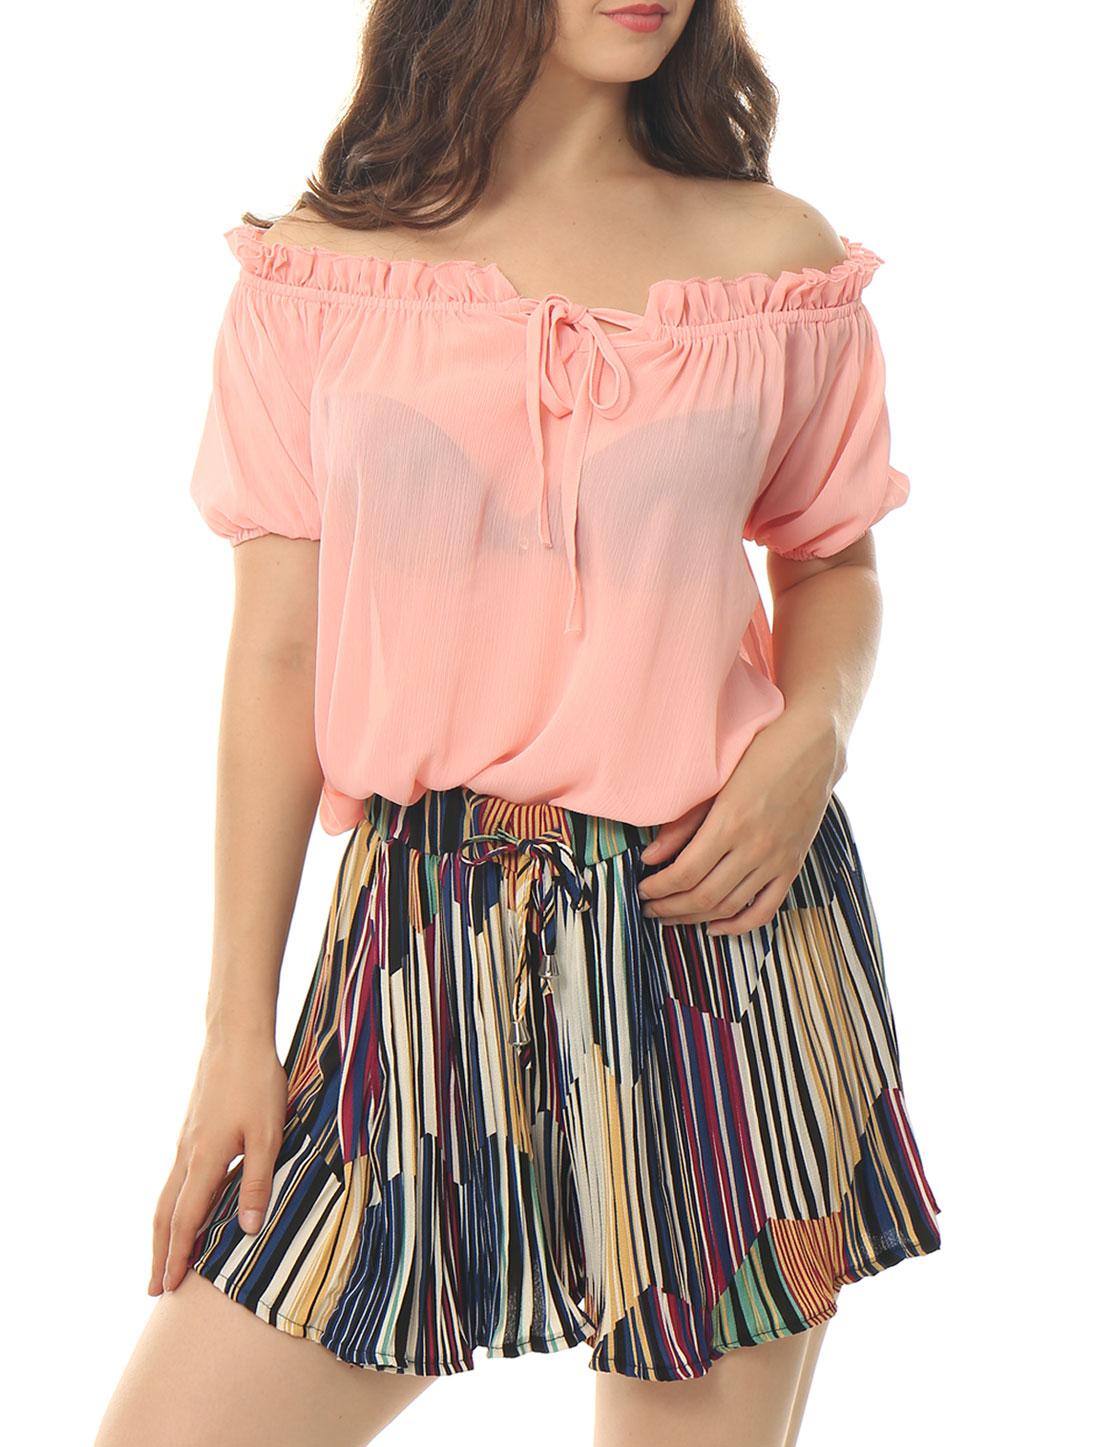 Women Off Shoulder Ruffle Self Tie Neck Semi Sheer Boho Blouse Pink S